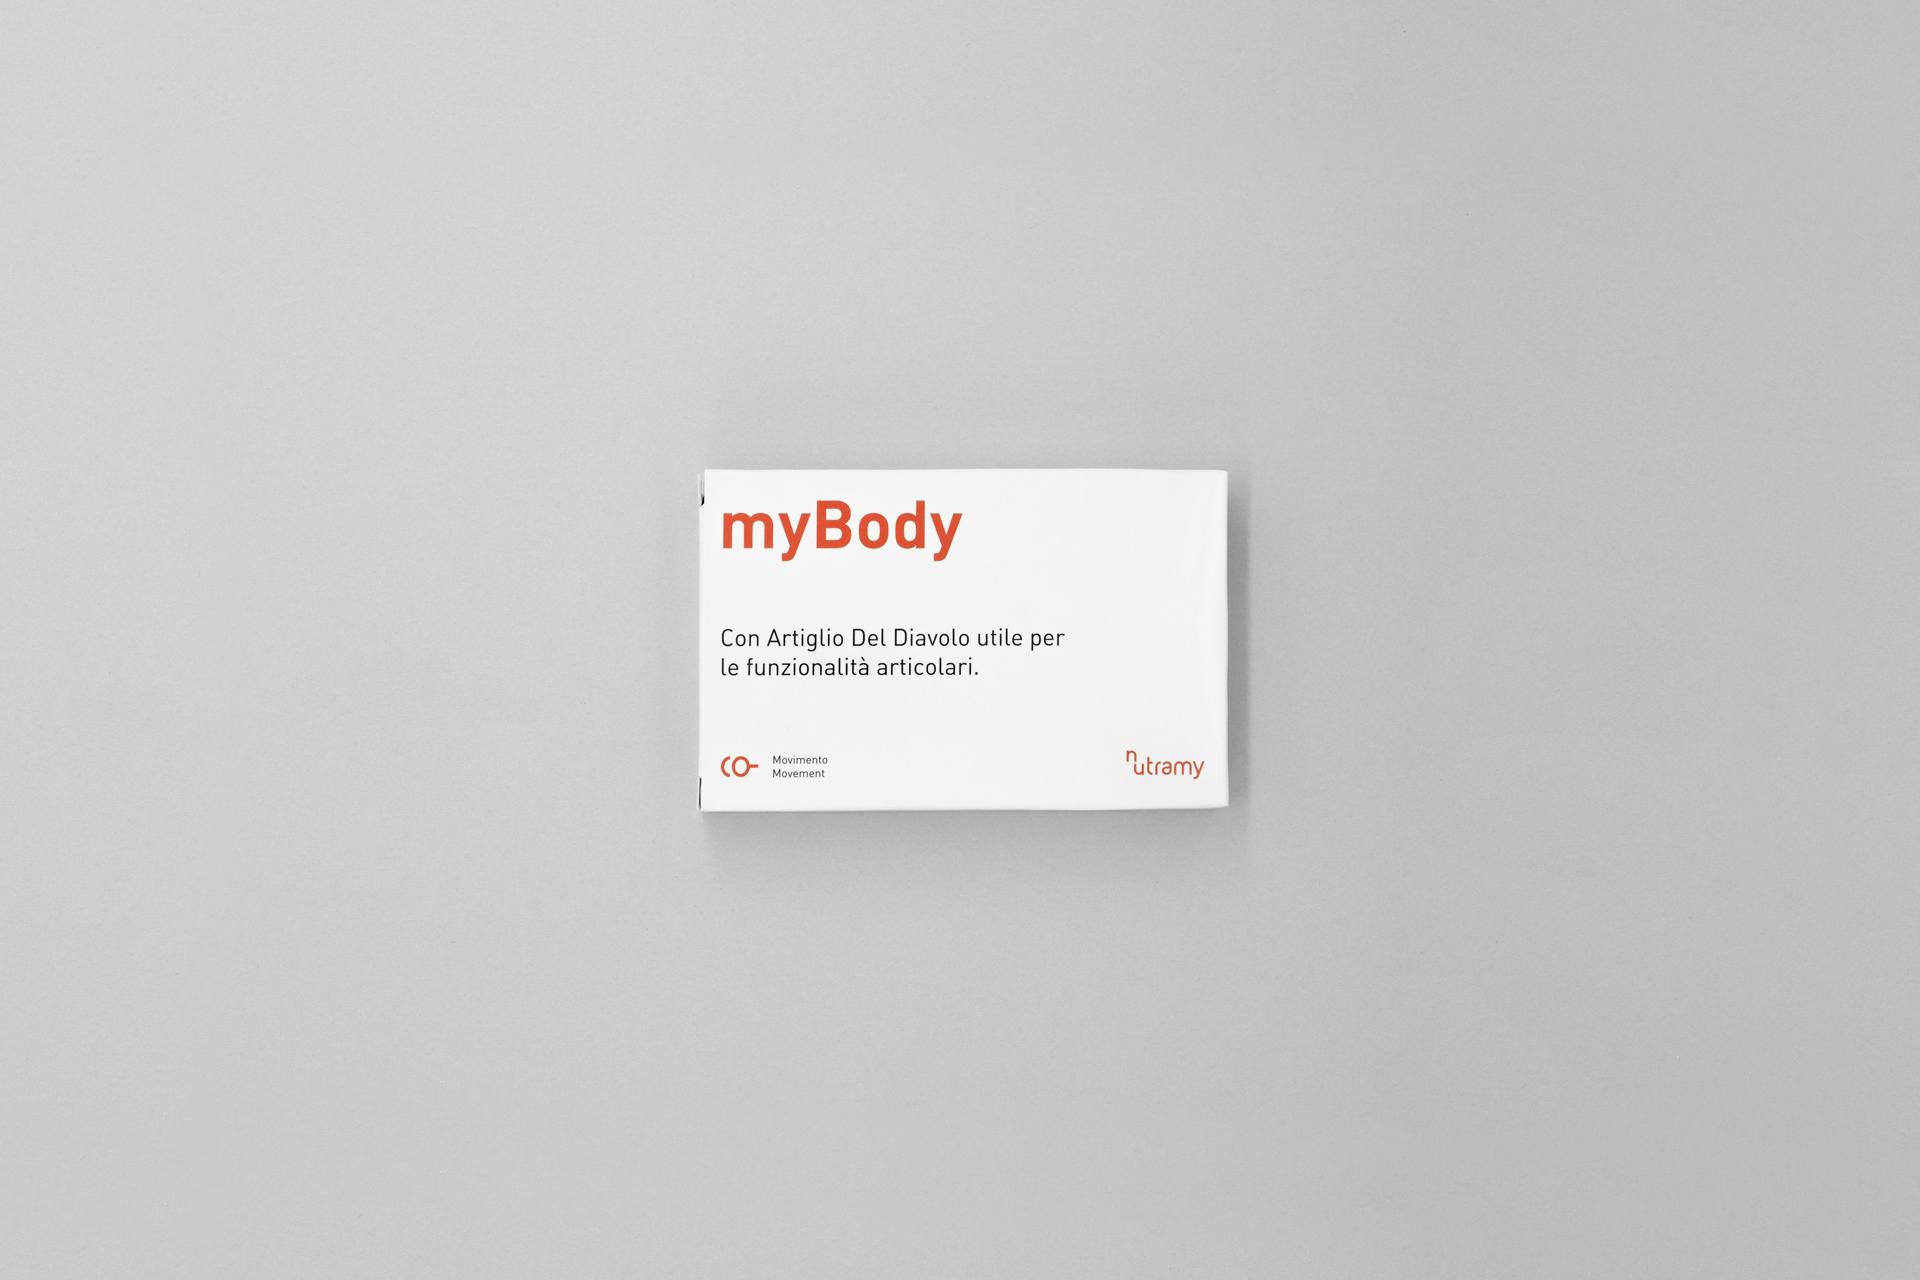 nutramy_pack_mybody